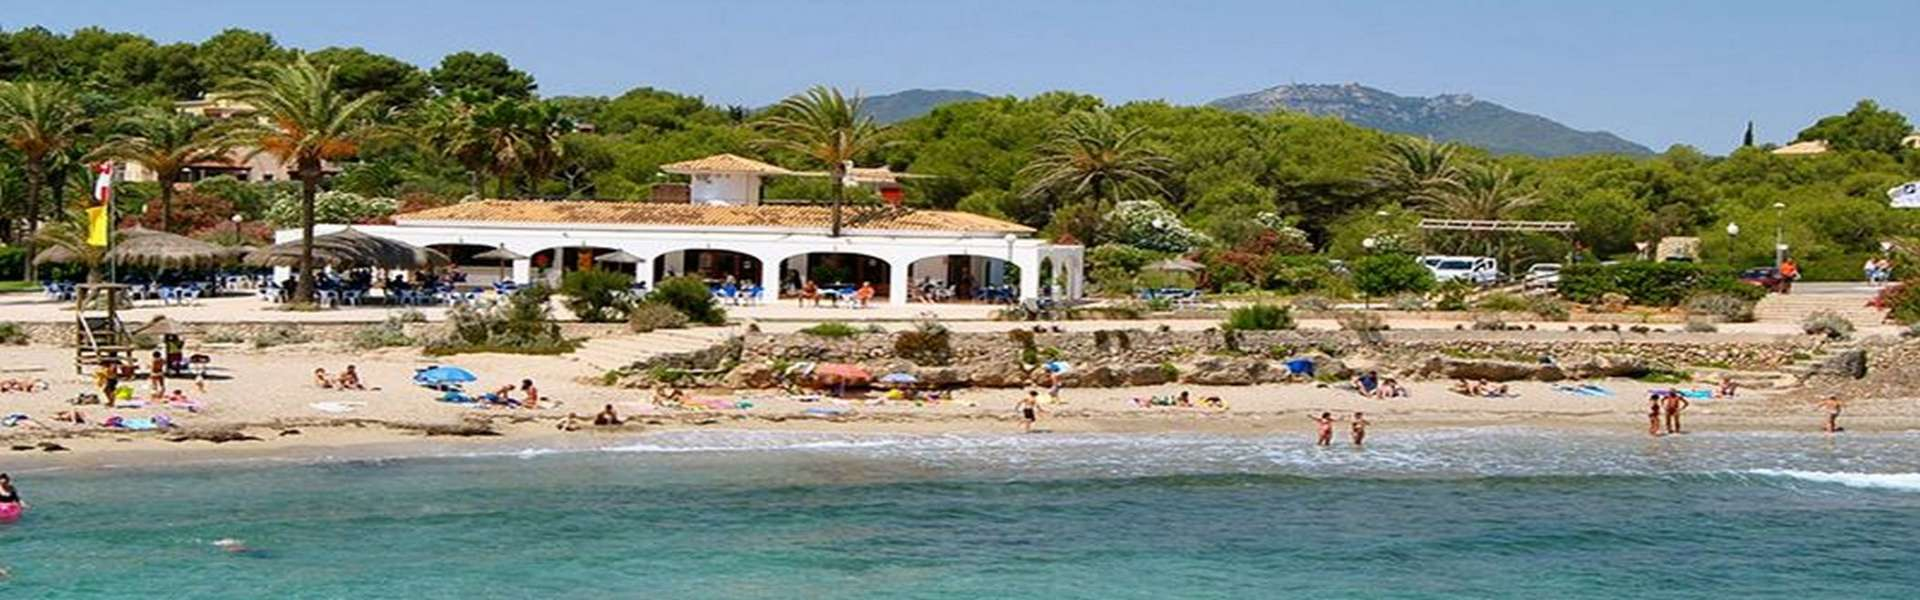 New construction villas just a few meters from Cala Murada beach